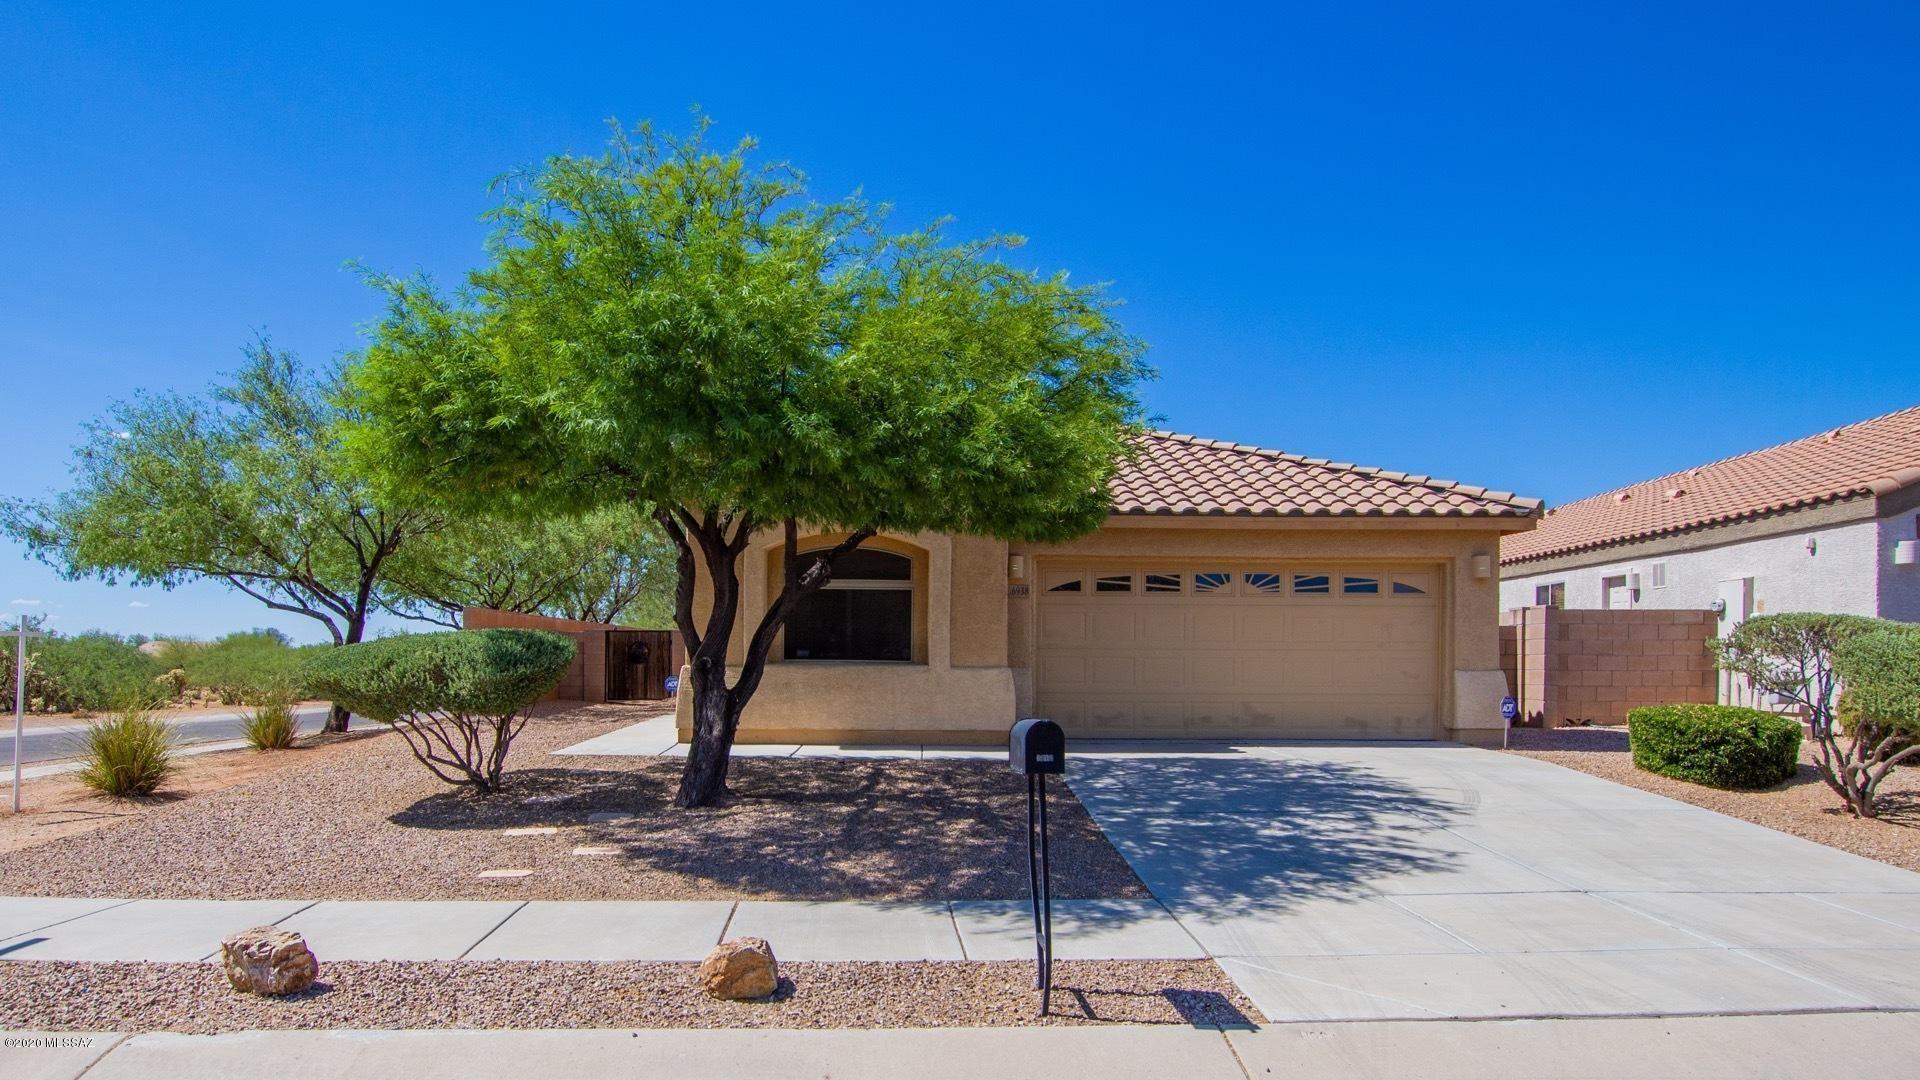 6938 W Quailwood Way, Tucson, AZ 85757 - MLS#: 22016813